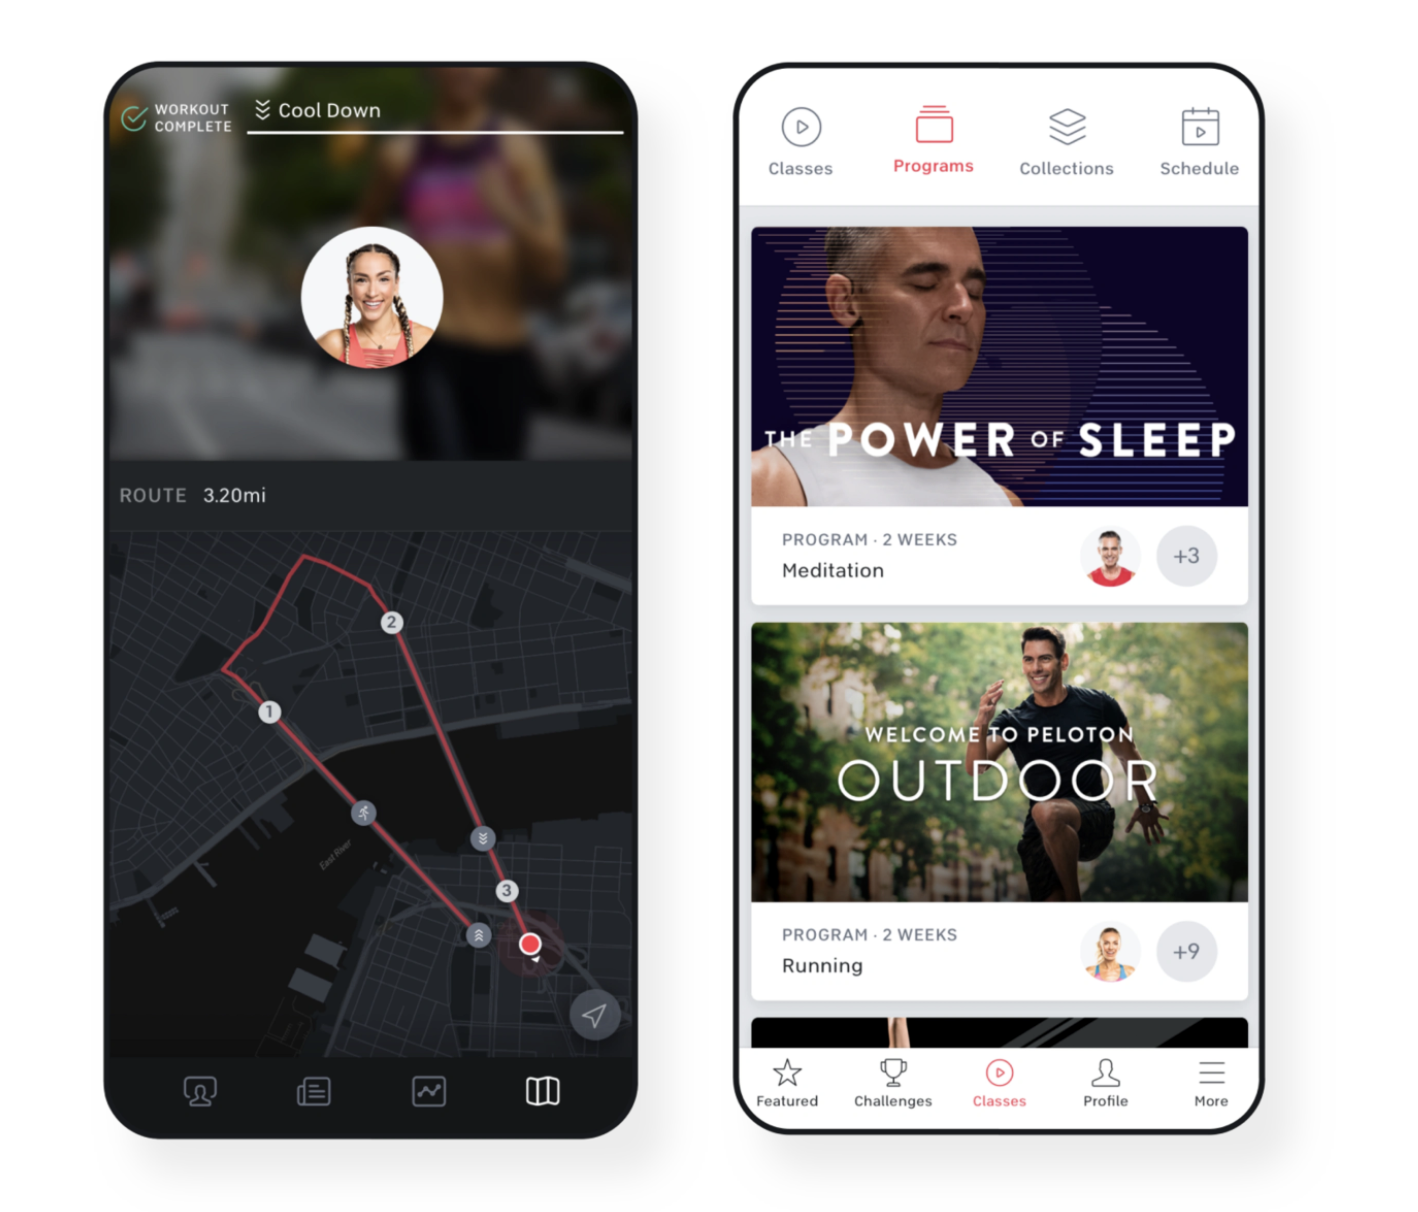 A screenshot of the Peloton app